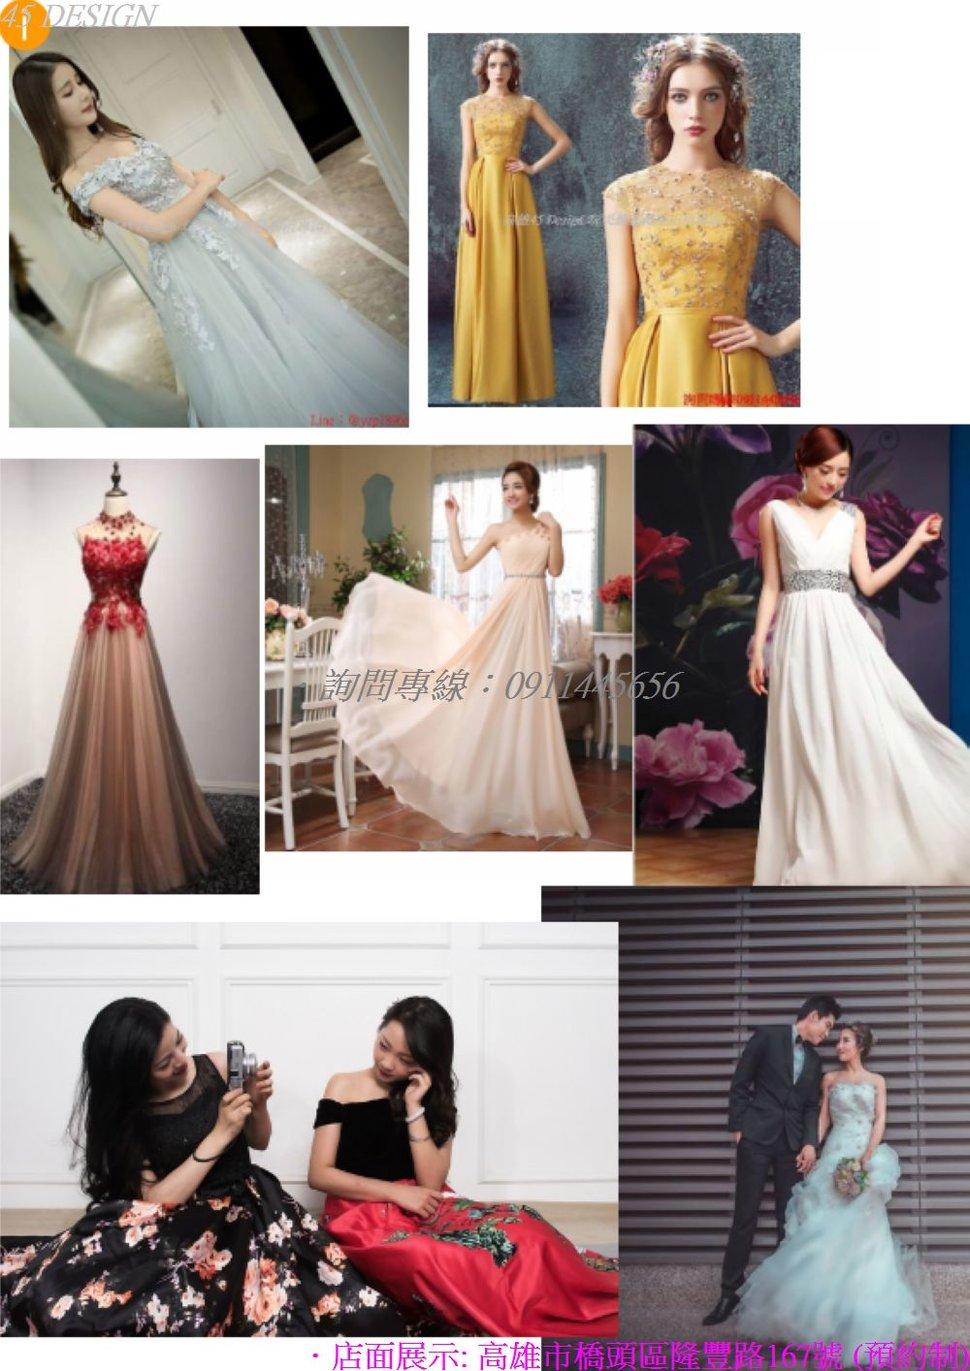 msl1908153989B3FFA3CA45439D73A2D0987AB13B - 全台最便宜-45DESIGN四五婚紗禮服《結婚吧》